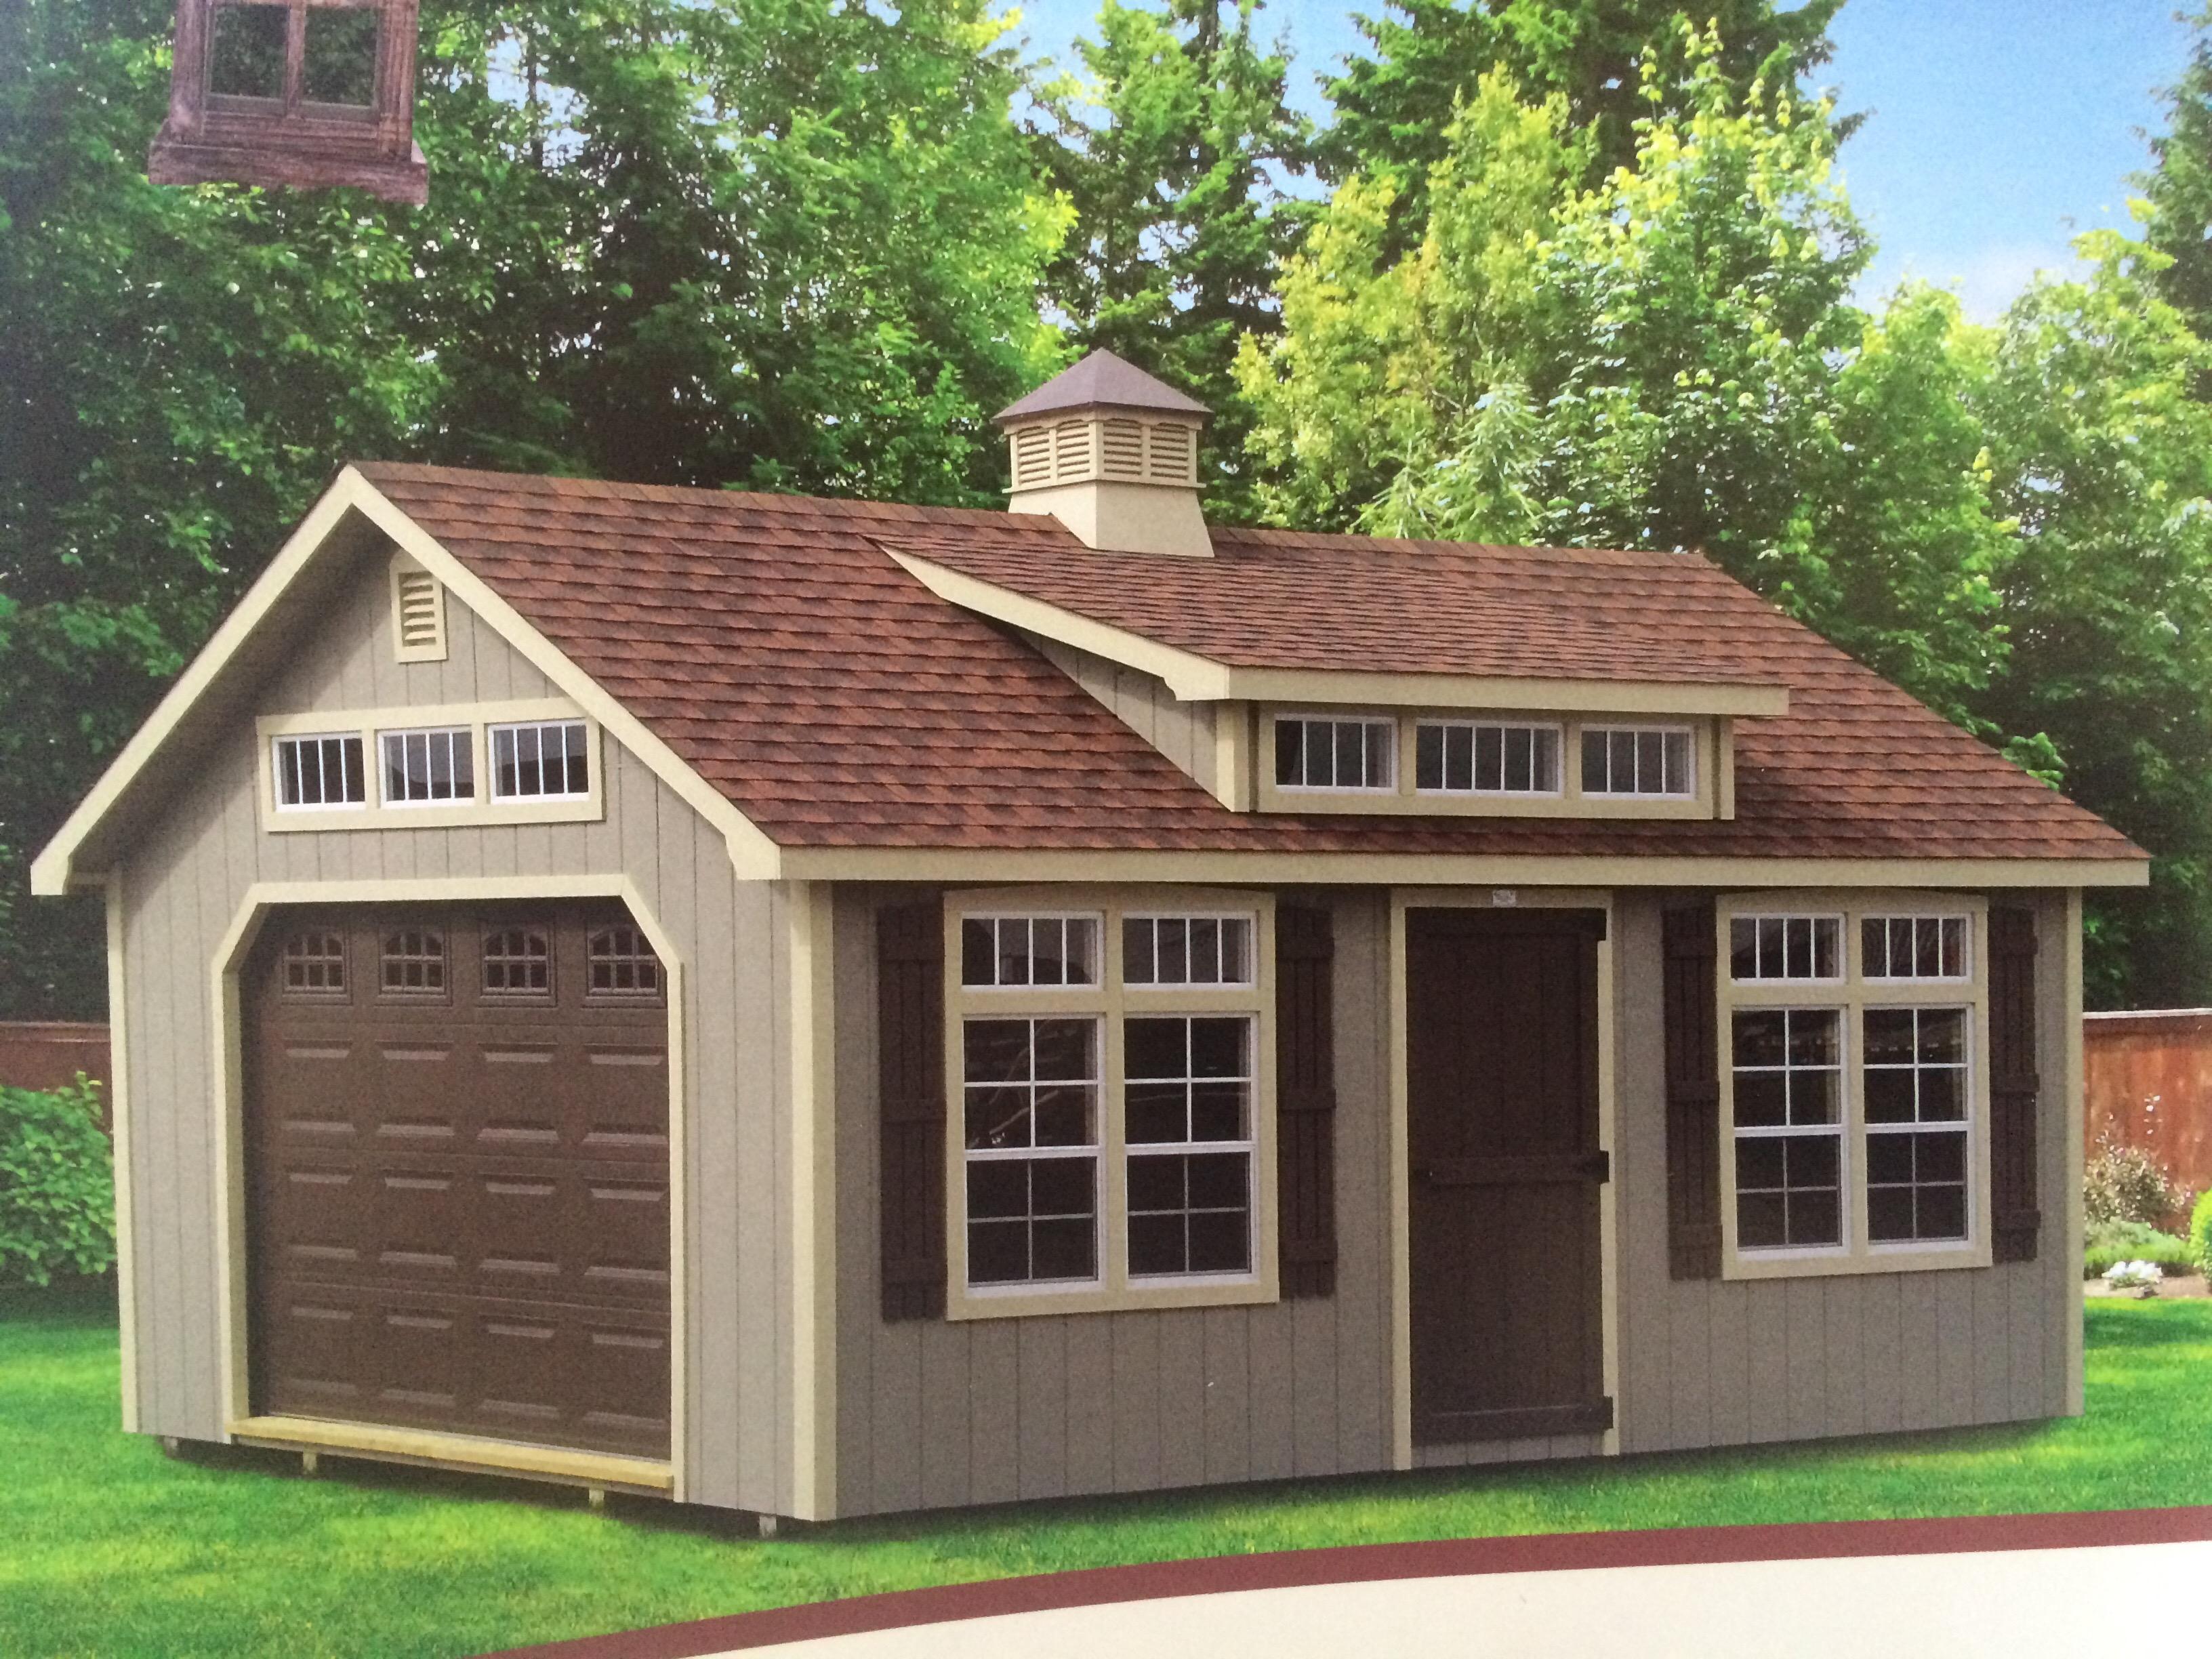 Garage Building An Excellent Home Design